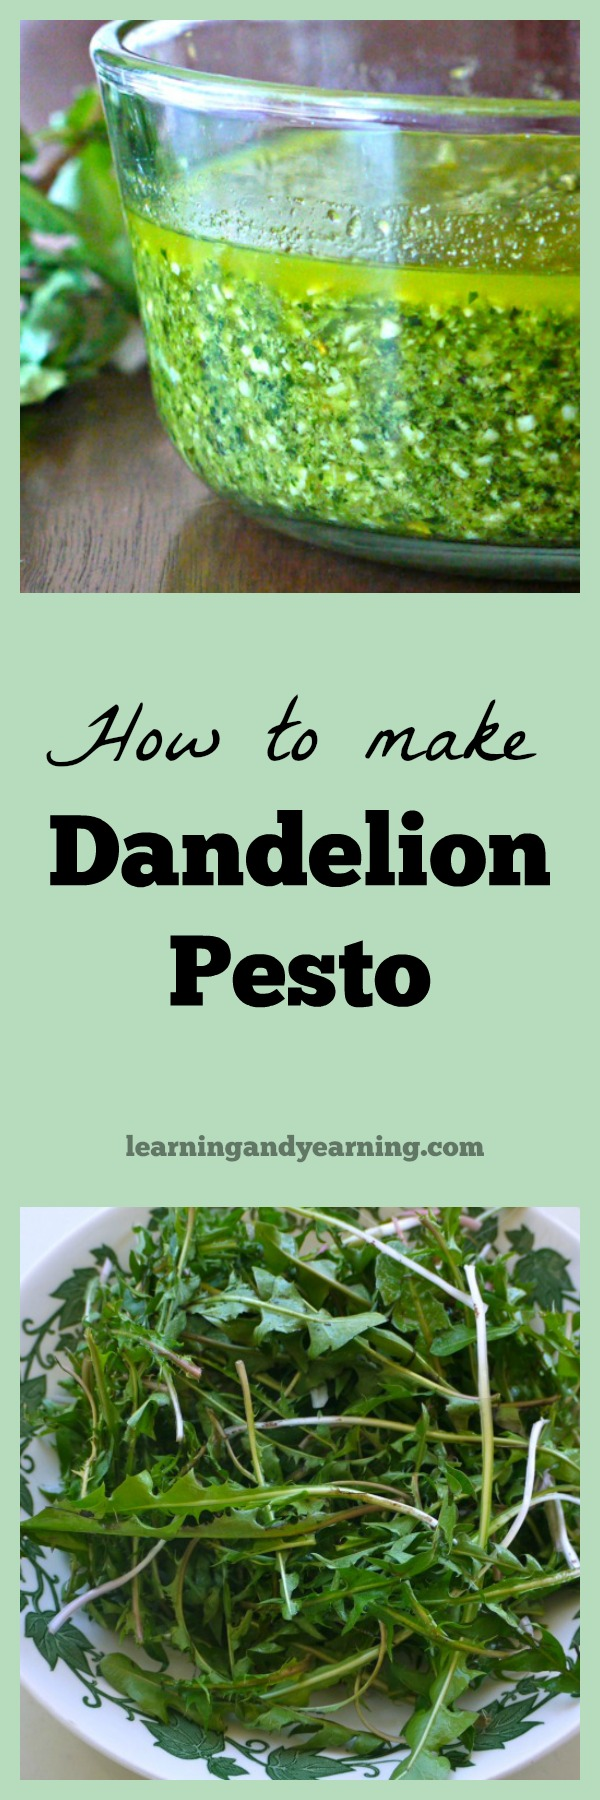 dandelion greens and dandelion pesto